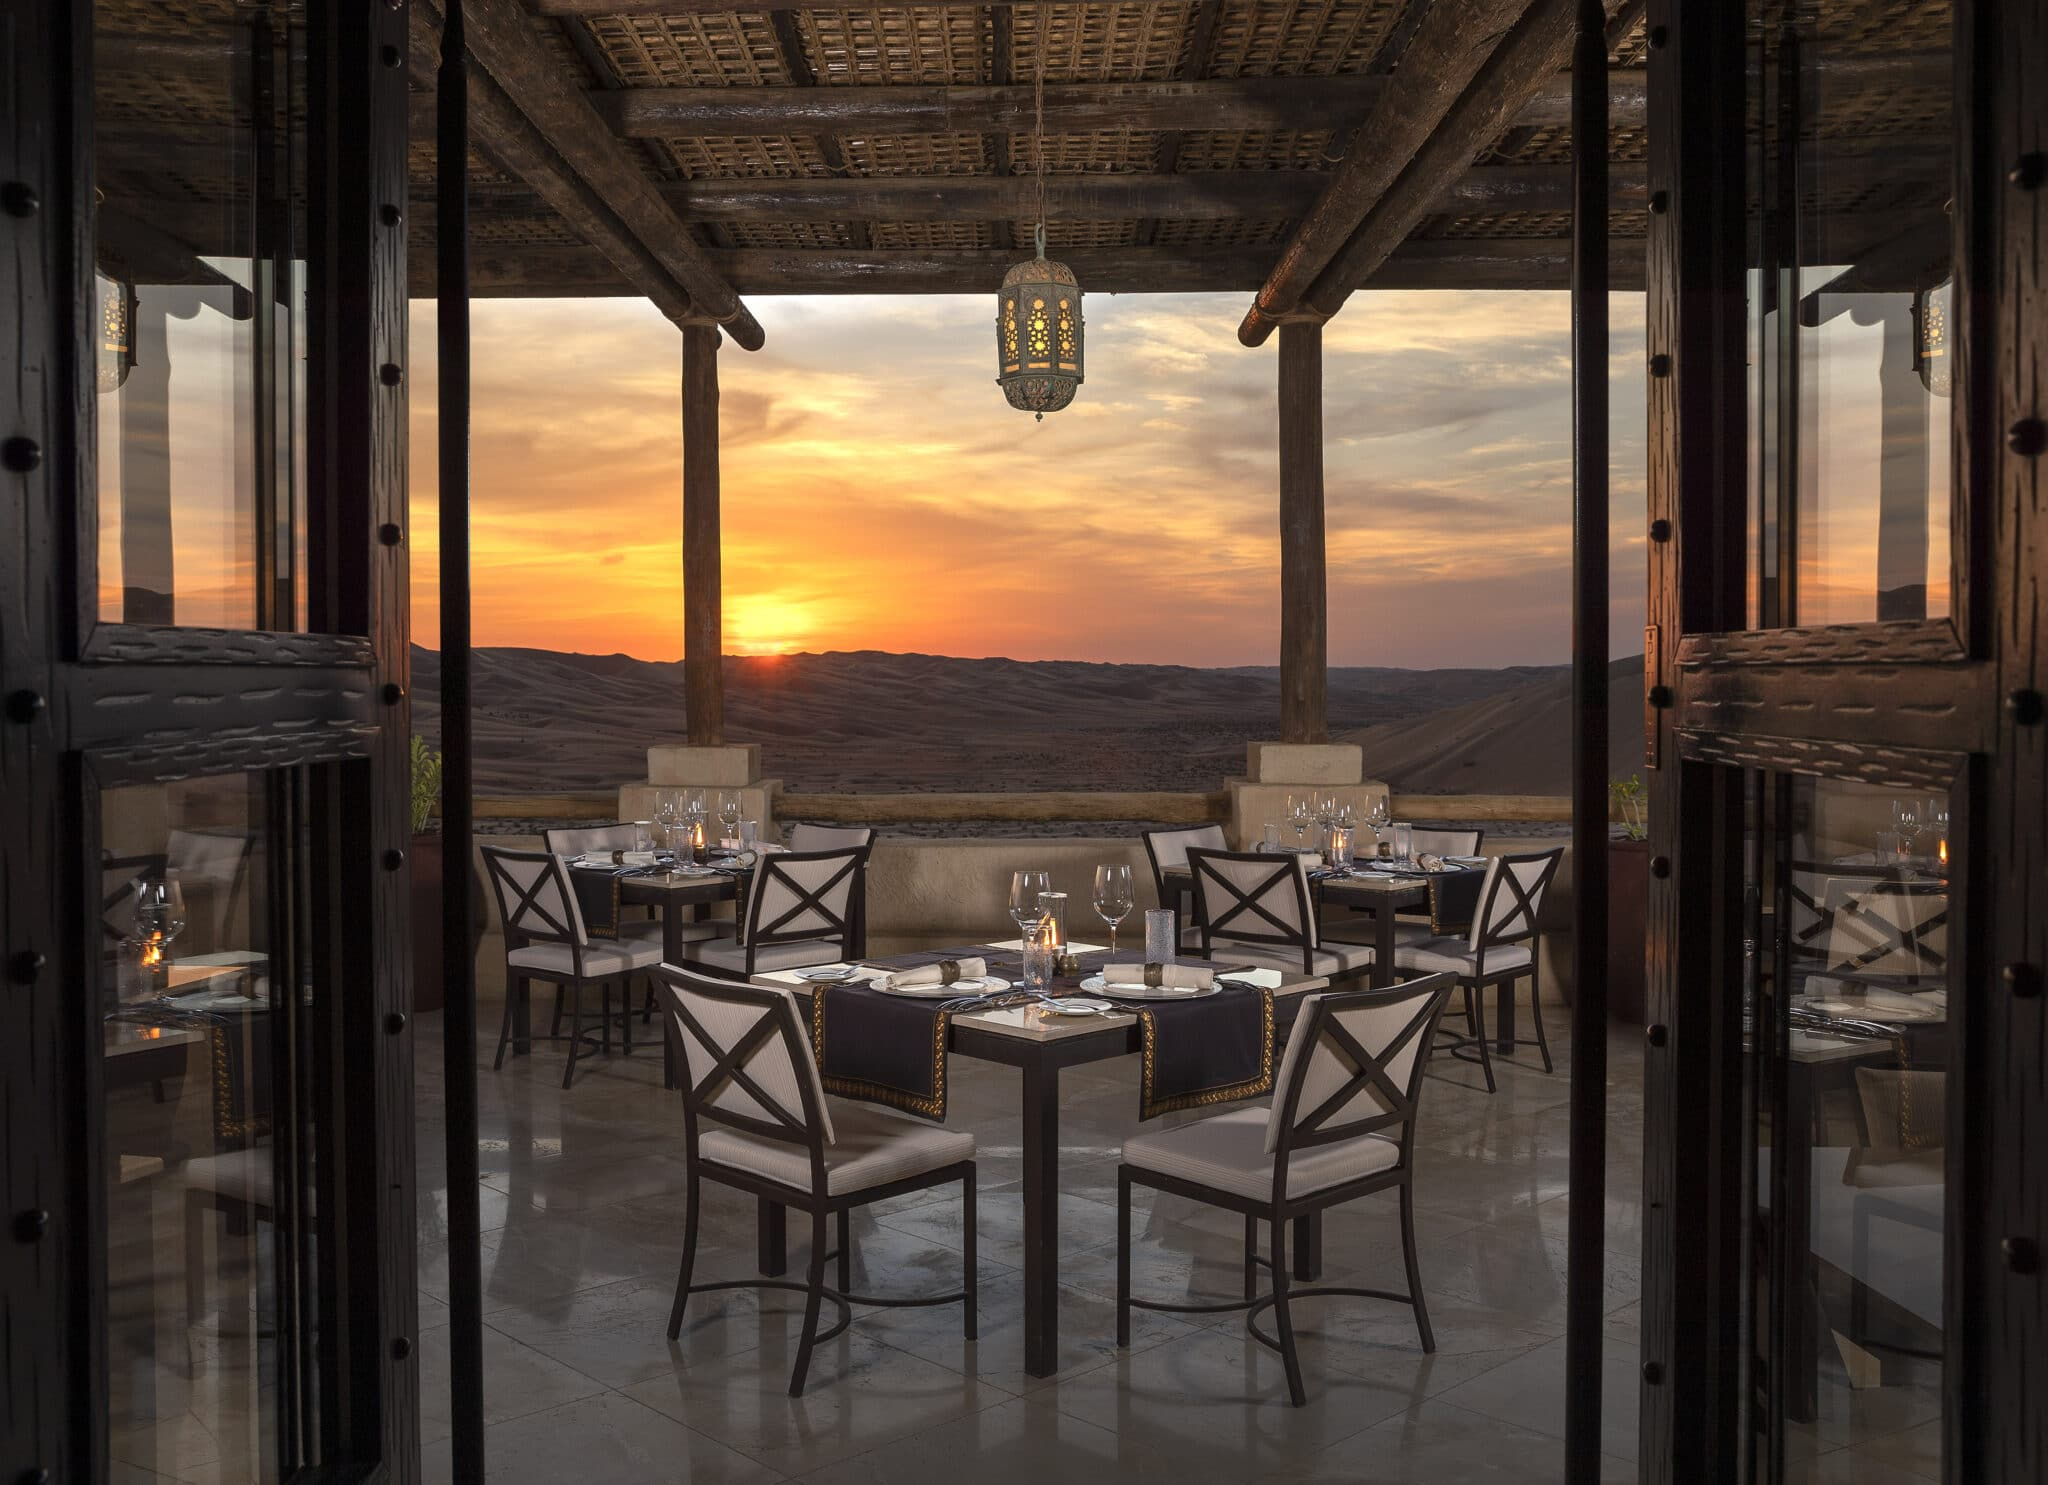 carrousel 11 Qasr_Al_Sarab_Desert_Resort_by_Anantara_Restaurants_Suhail_Outdoor_Terrace_Sunset